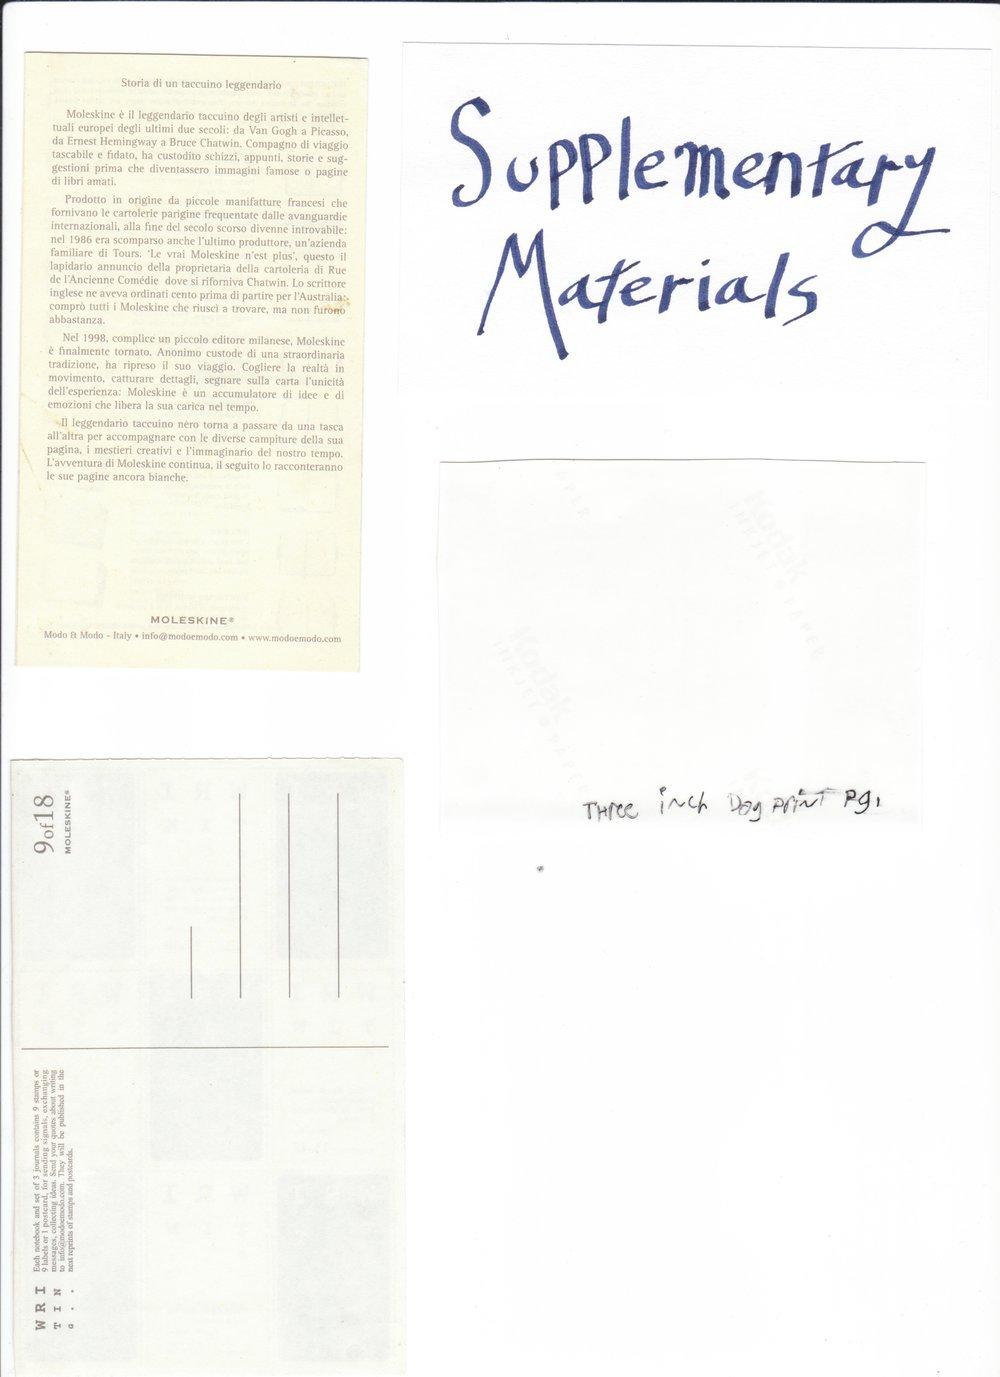 Notebook1_Page_46.jpg